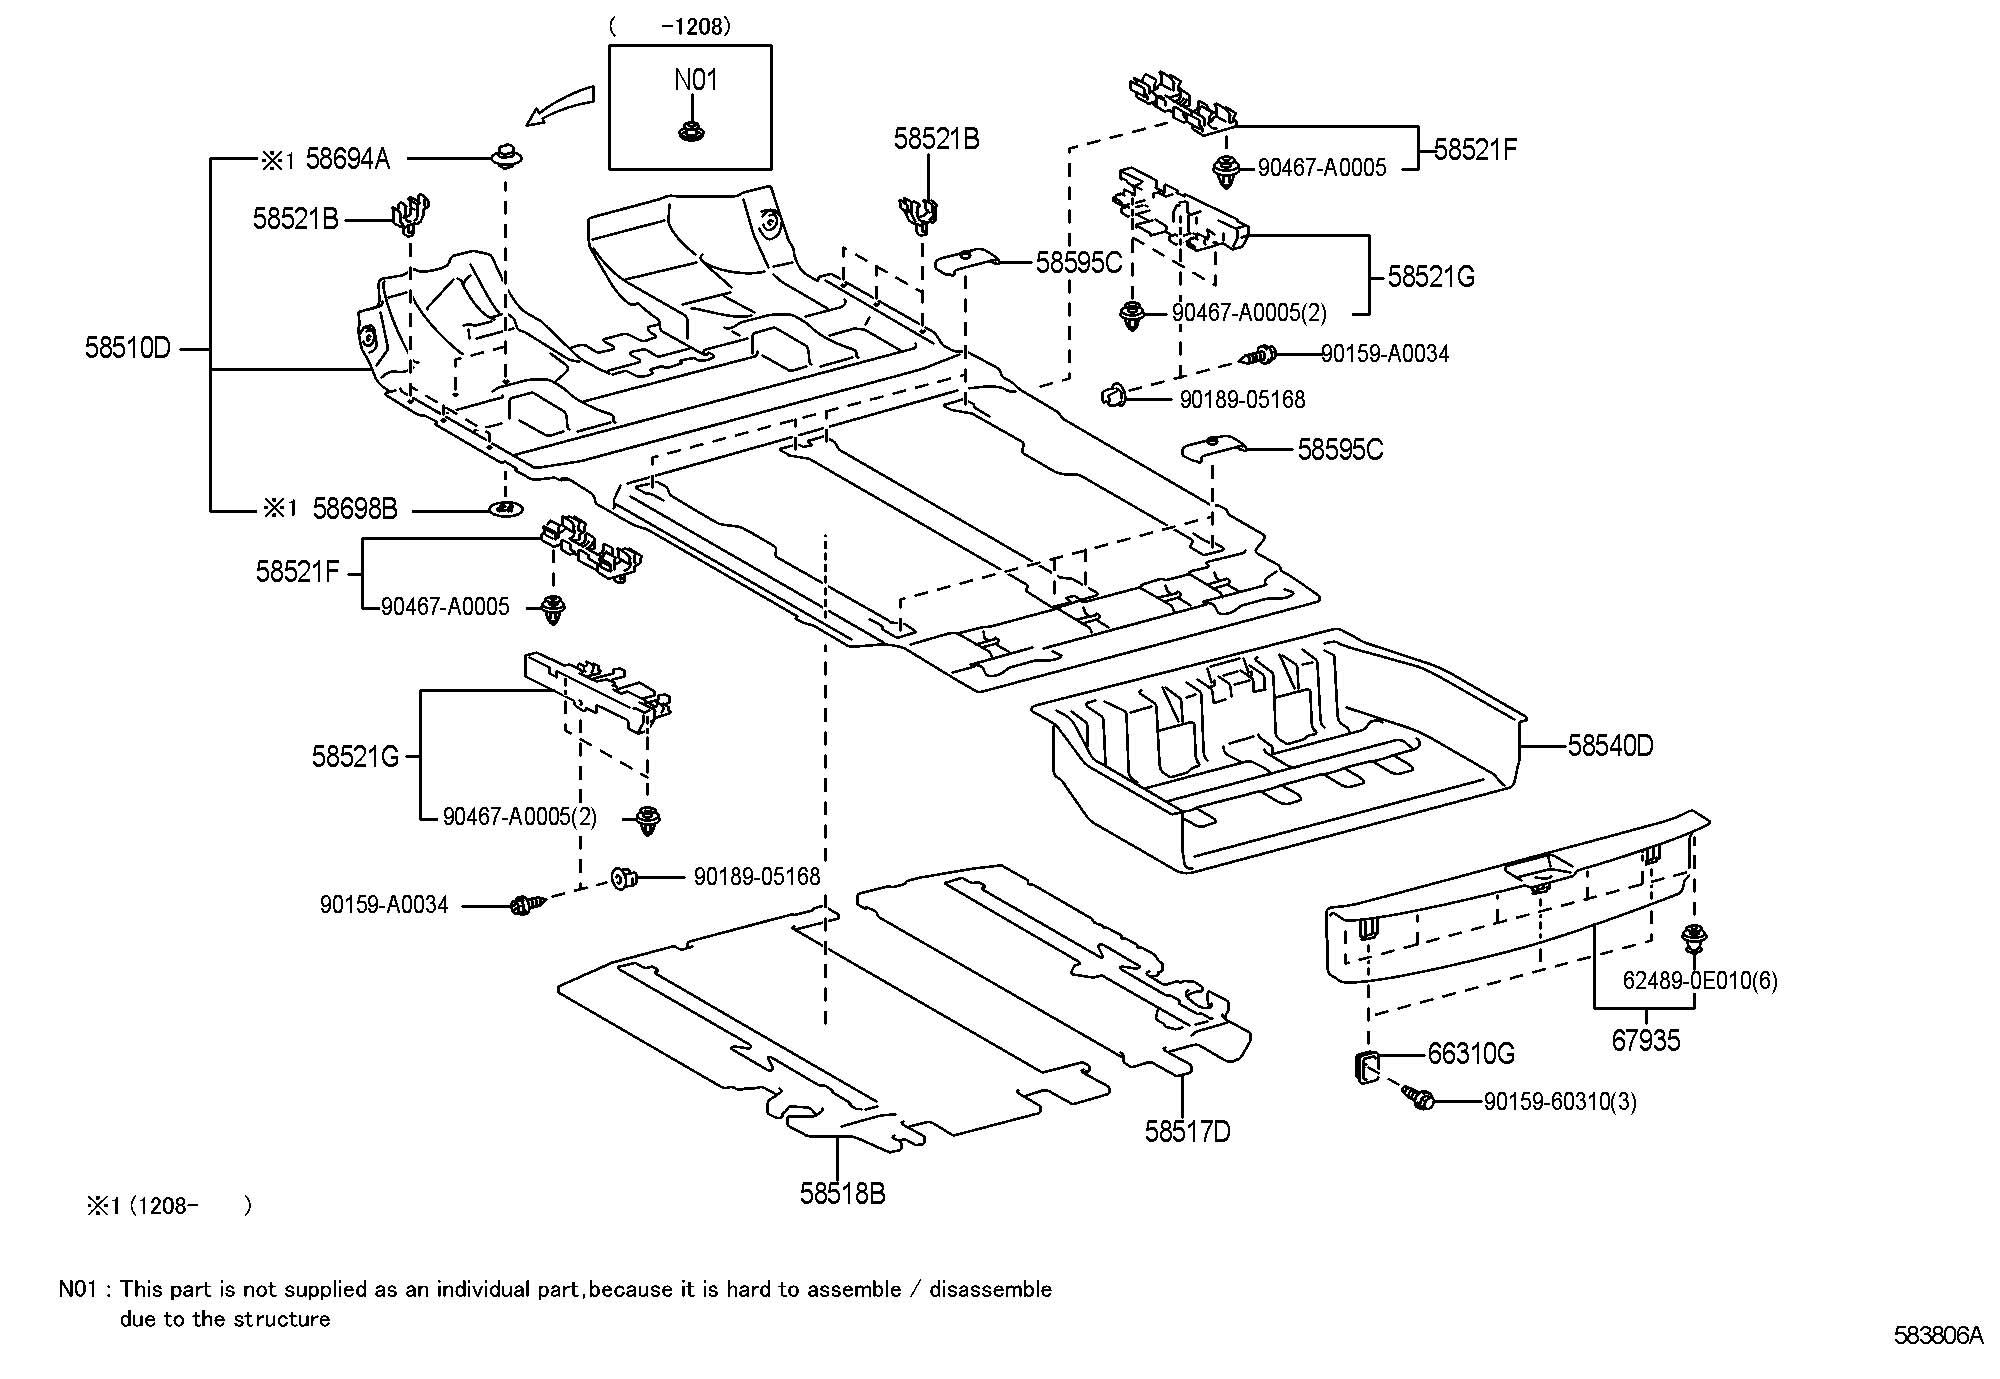 Toyota Sienna Mat Rear Floor No 2 Mat Rr Floor No 2